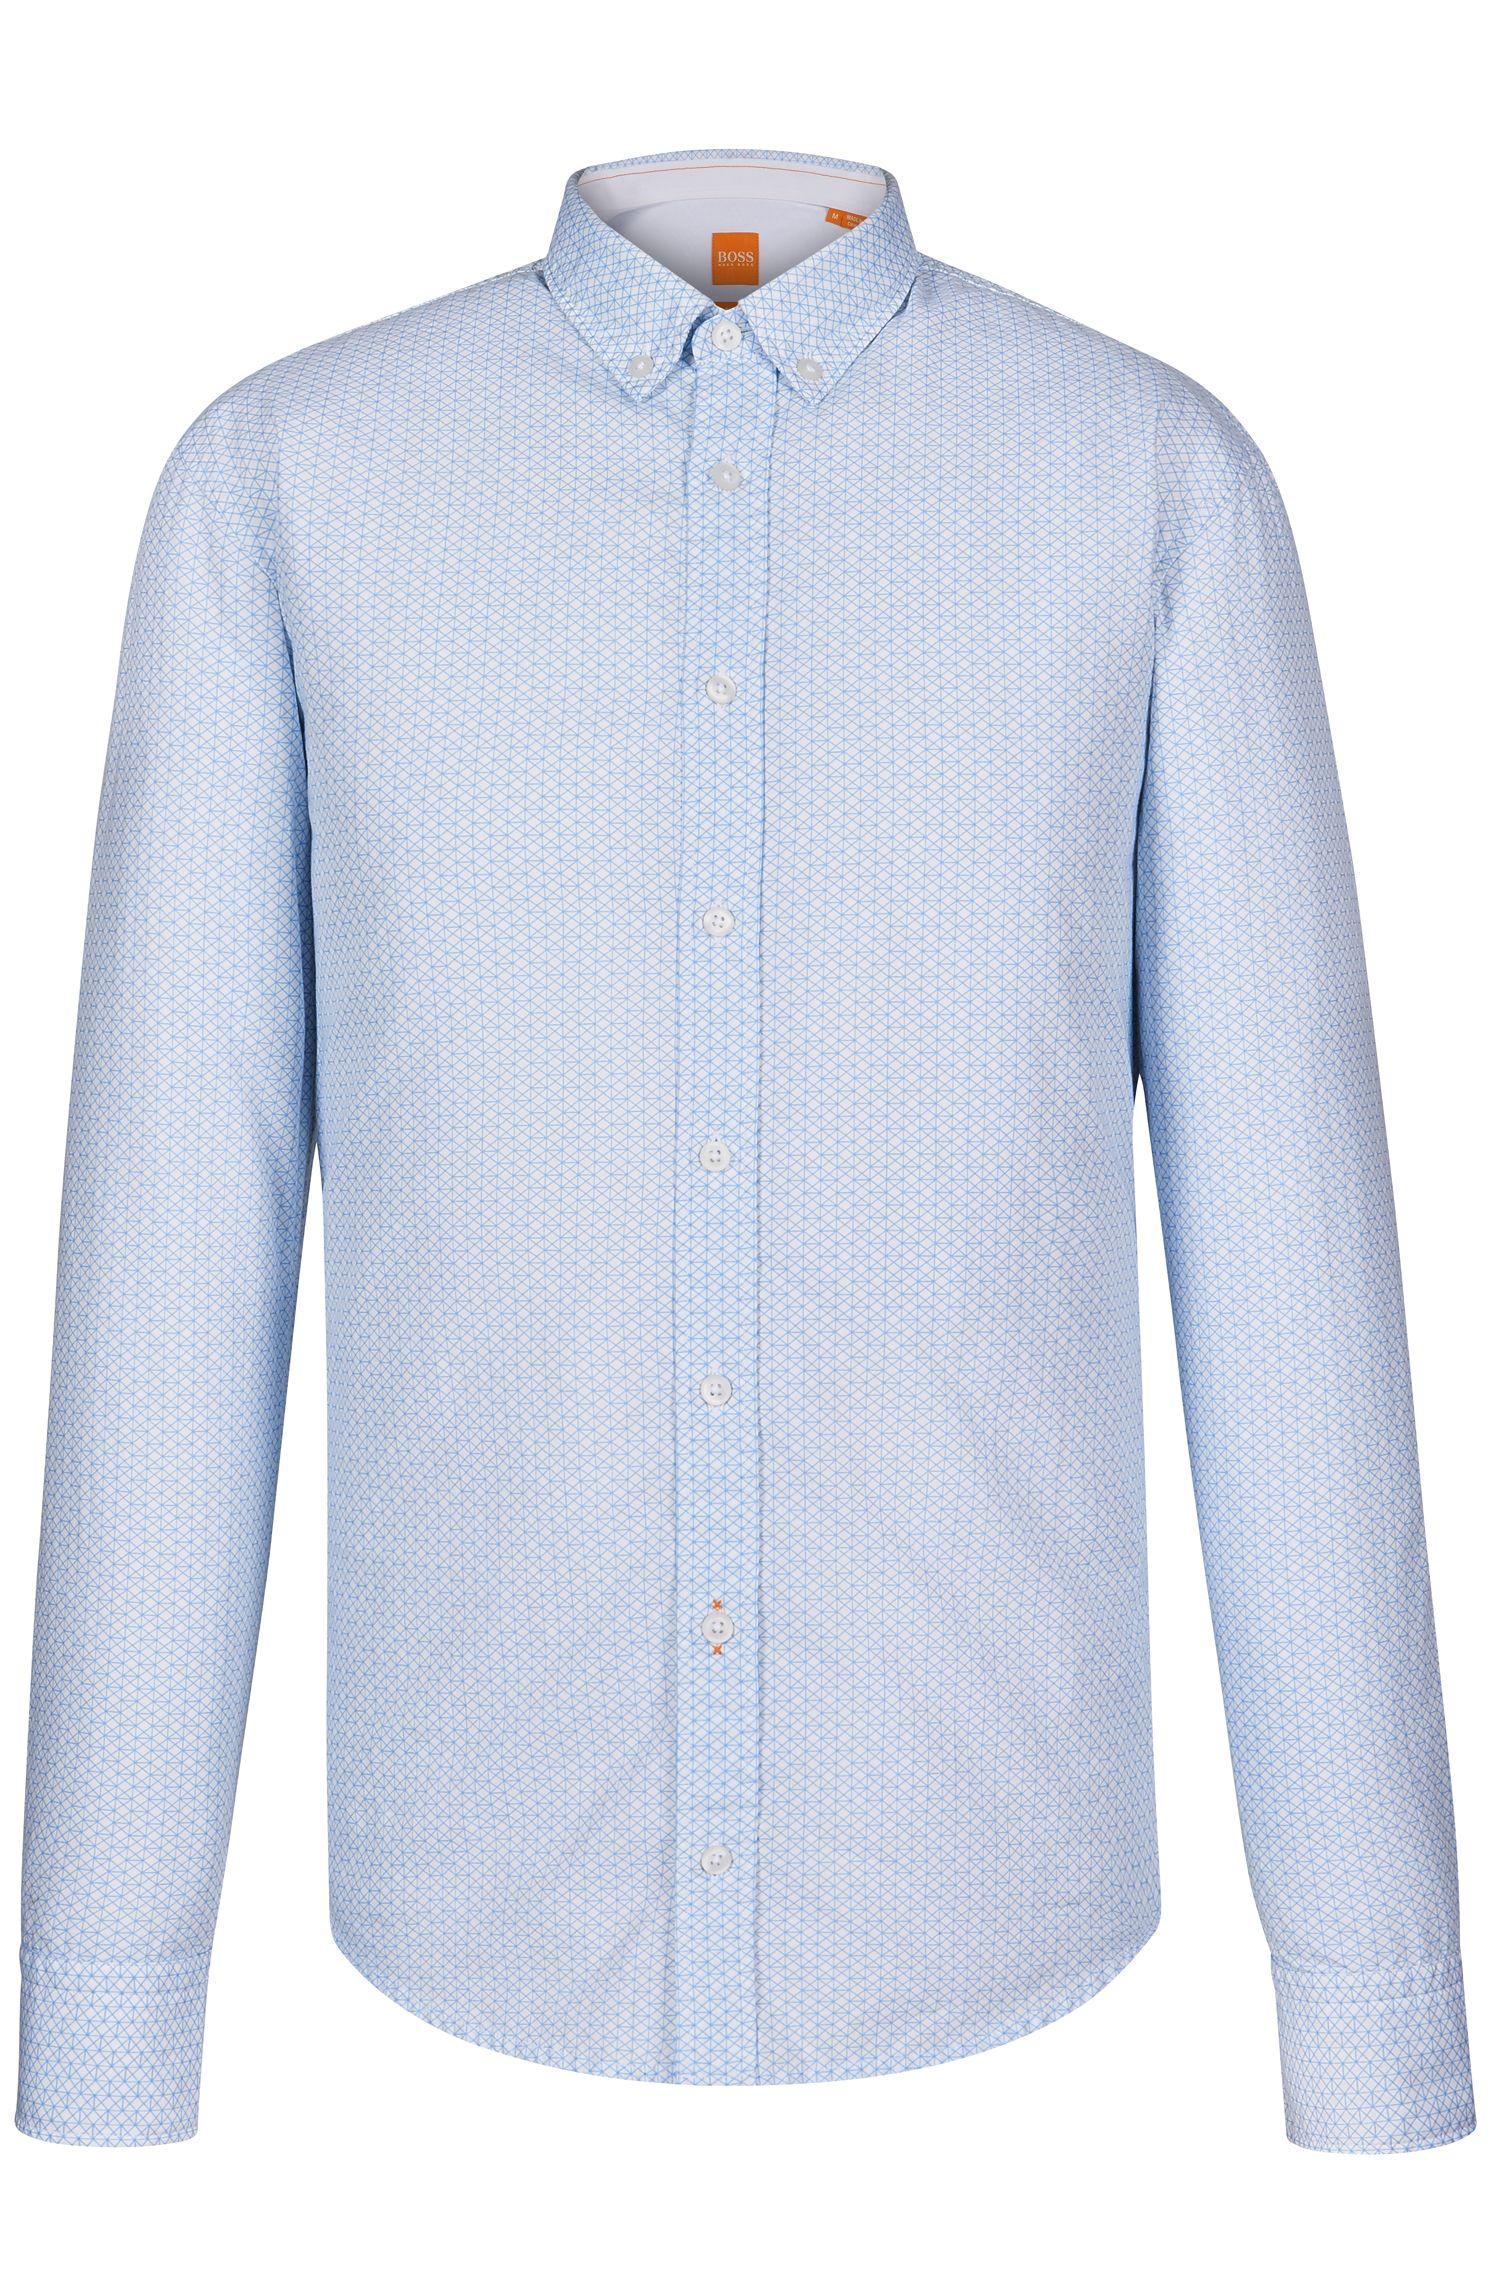 Cotton Button Down Shirt, Slim Fit | EdipoE, Light Blue